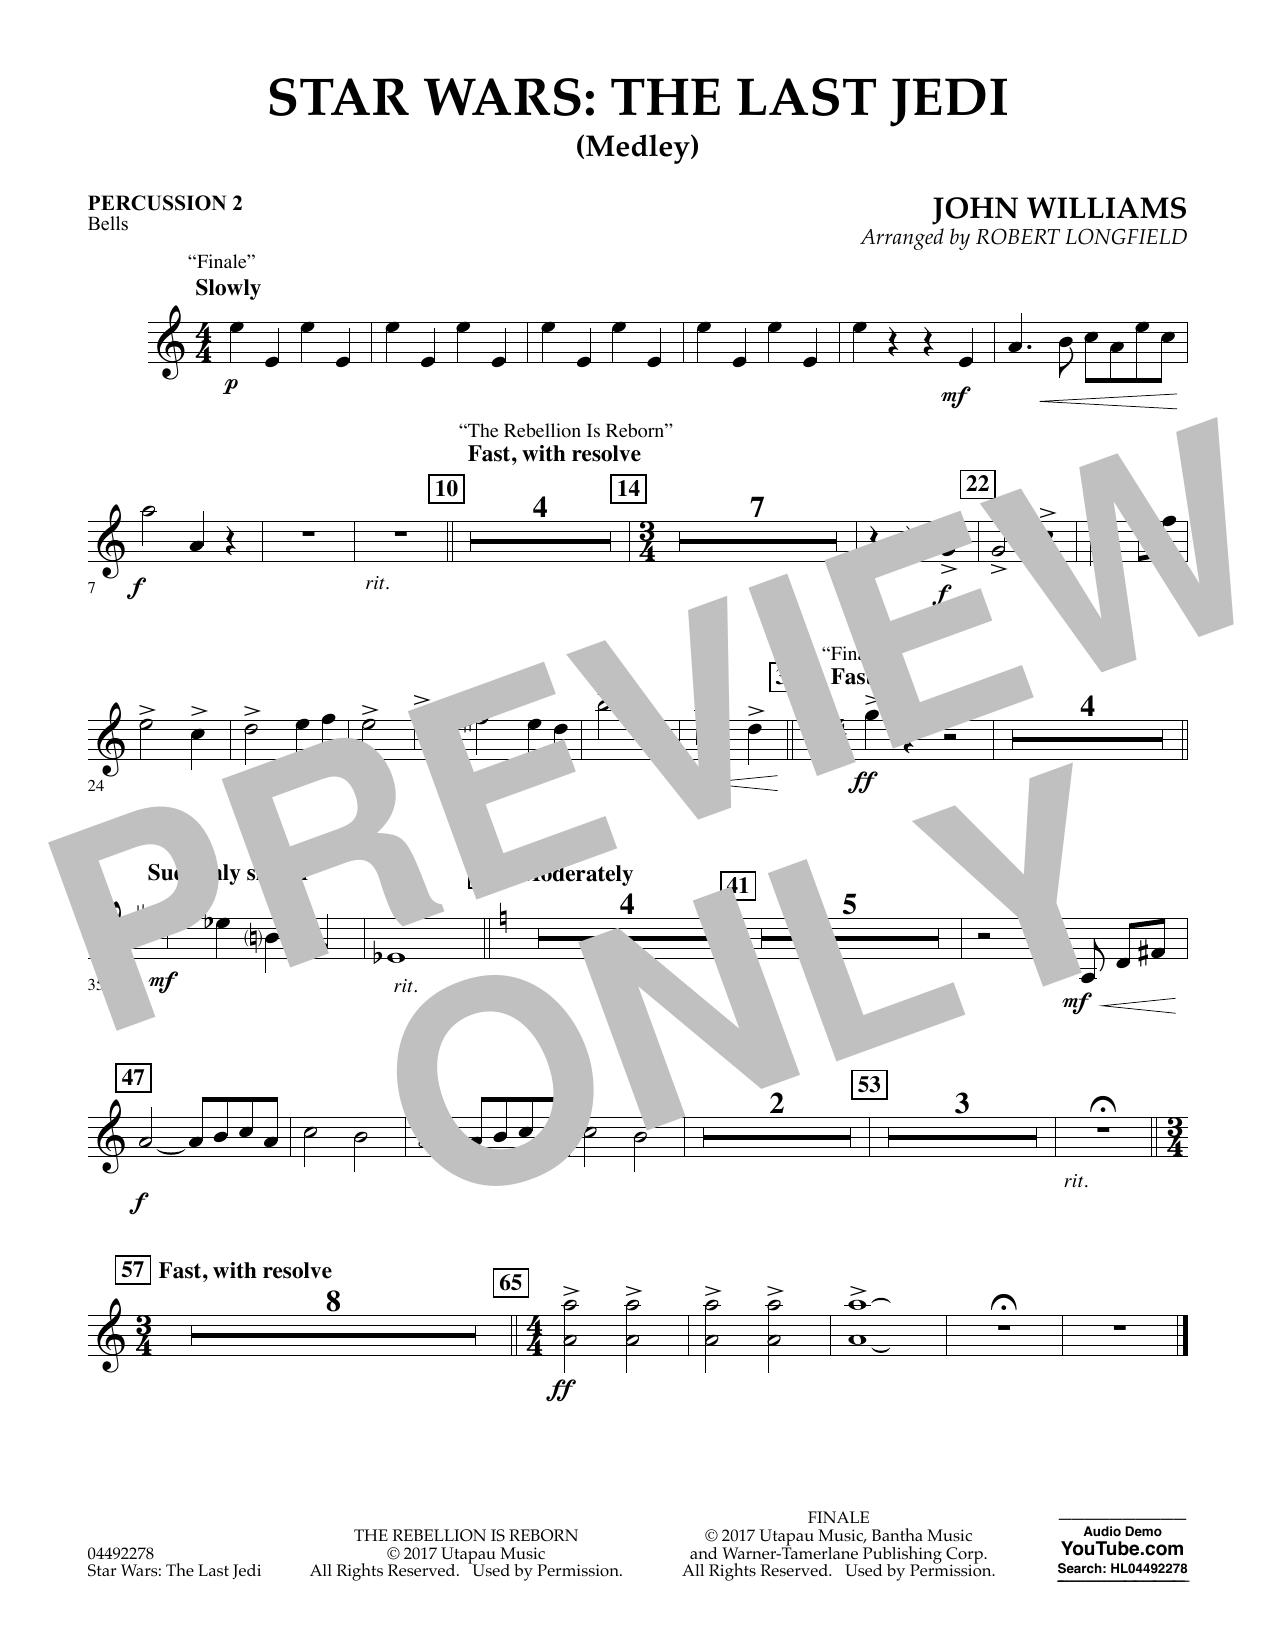 Star Wars: The Last Jedi (Medley) (arr. Robert Longfield) - Percussion 2 (Orchestra)